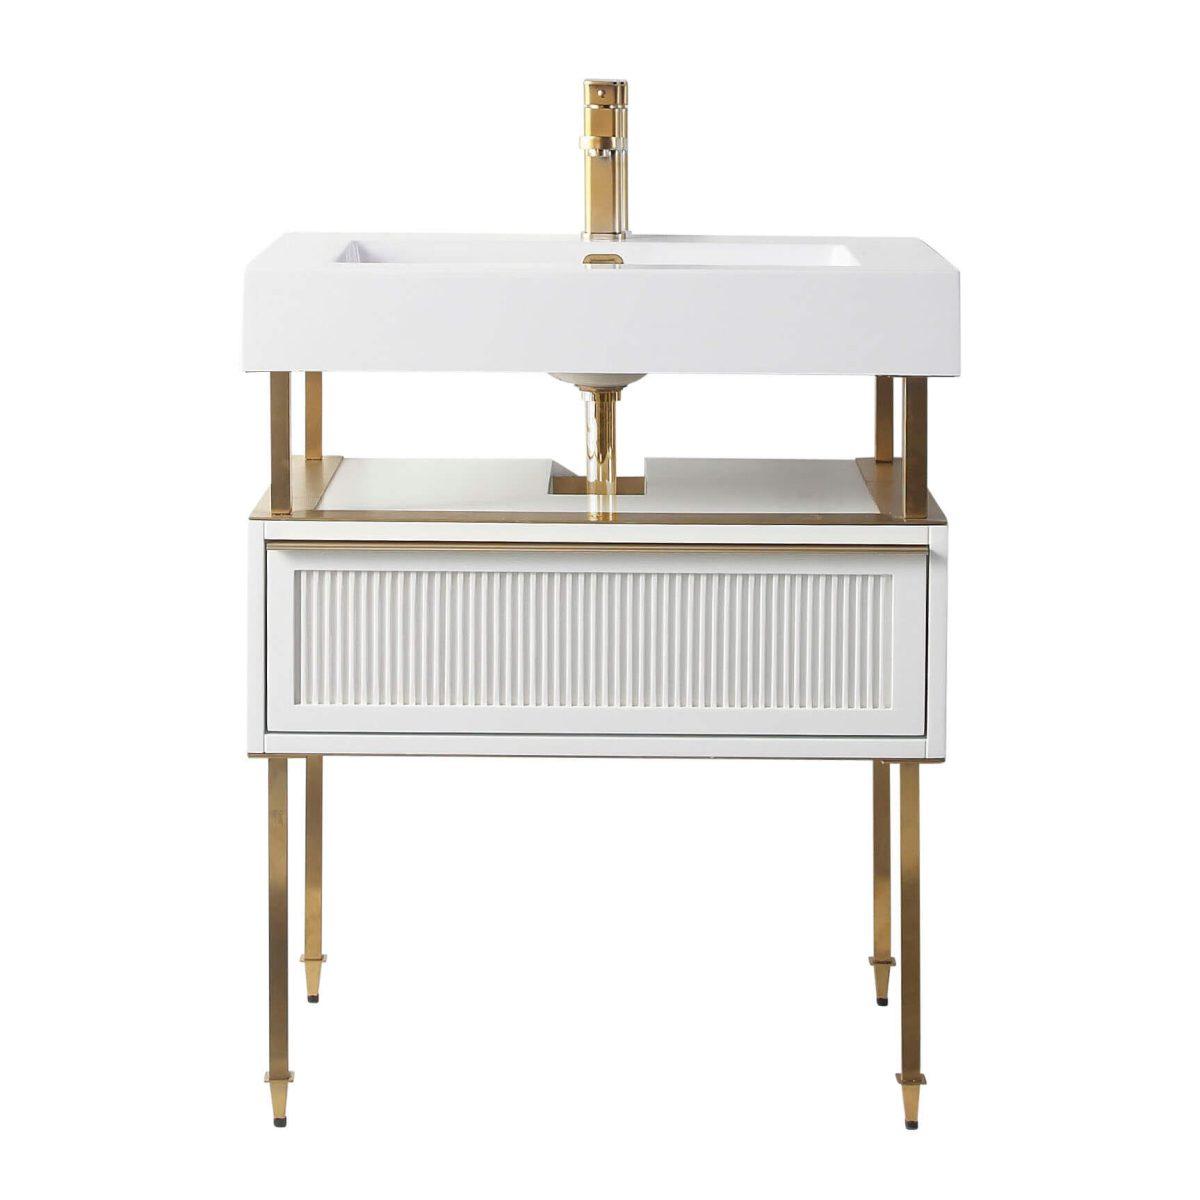 "Dakota 30"" Modern Bathroom Vanity  White with Satin Bras Hardware"